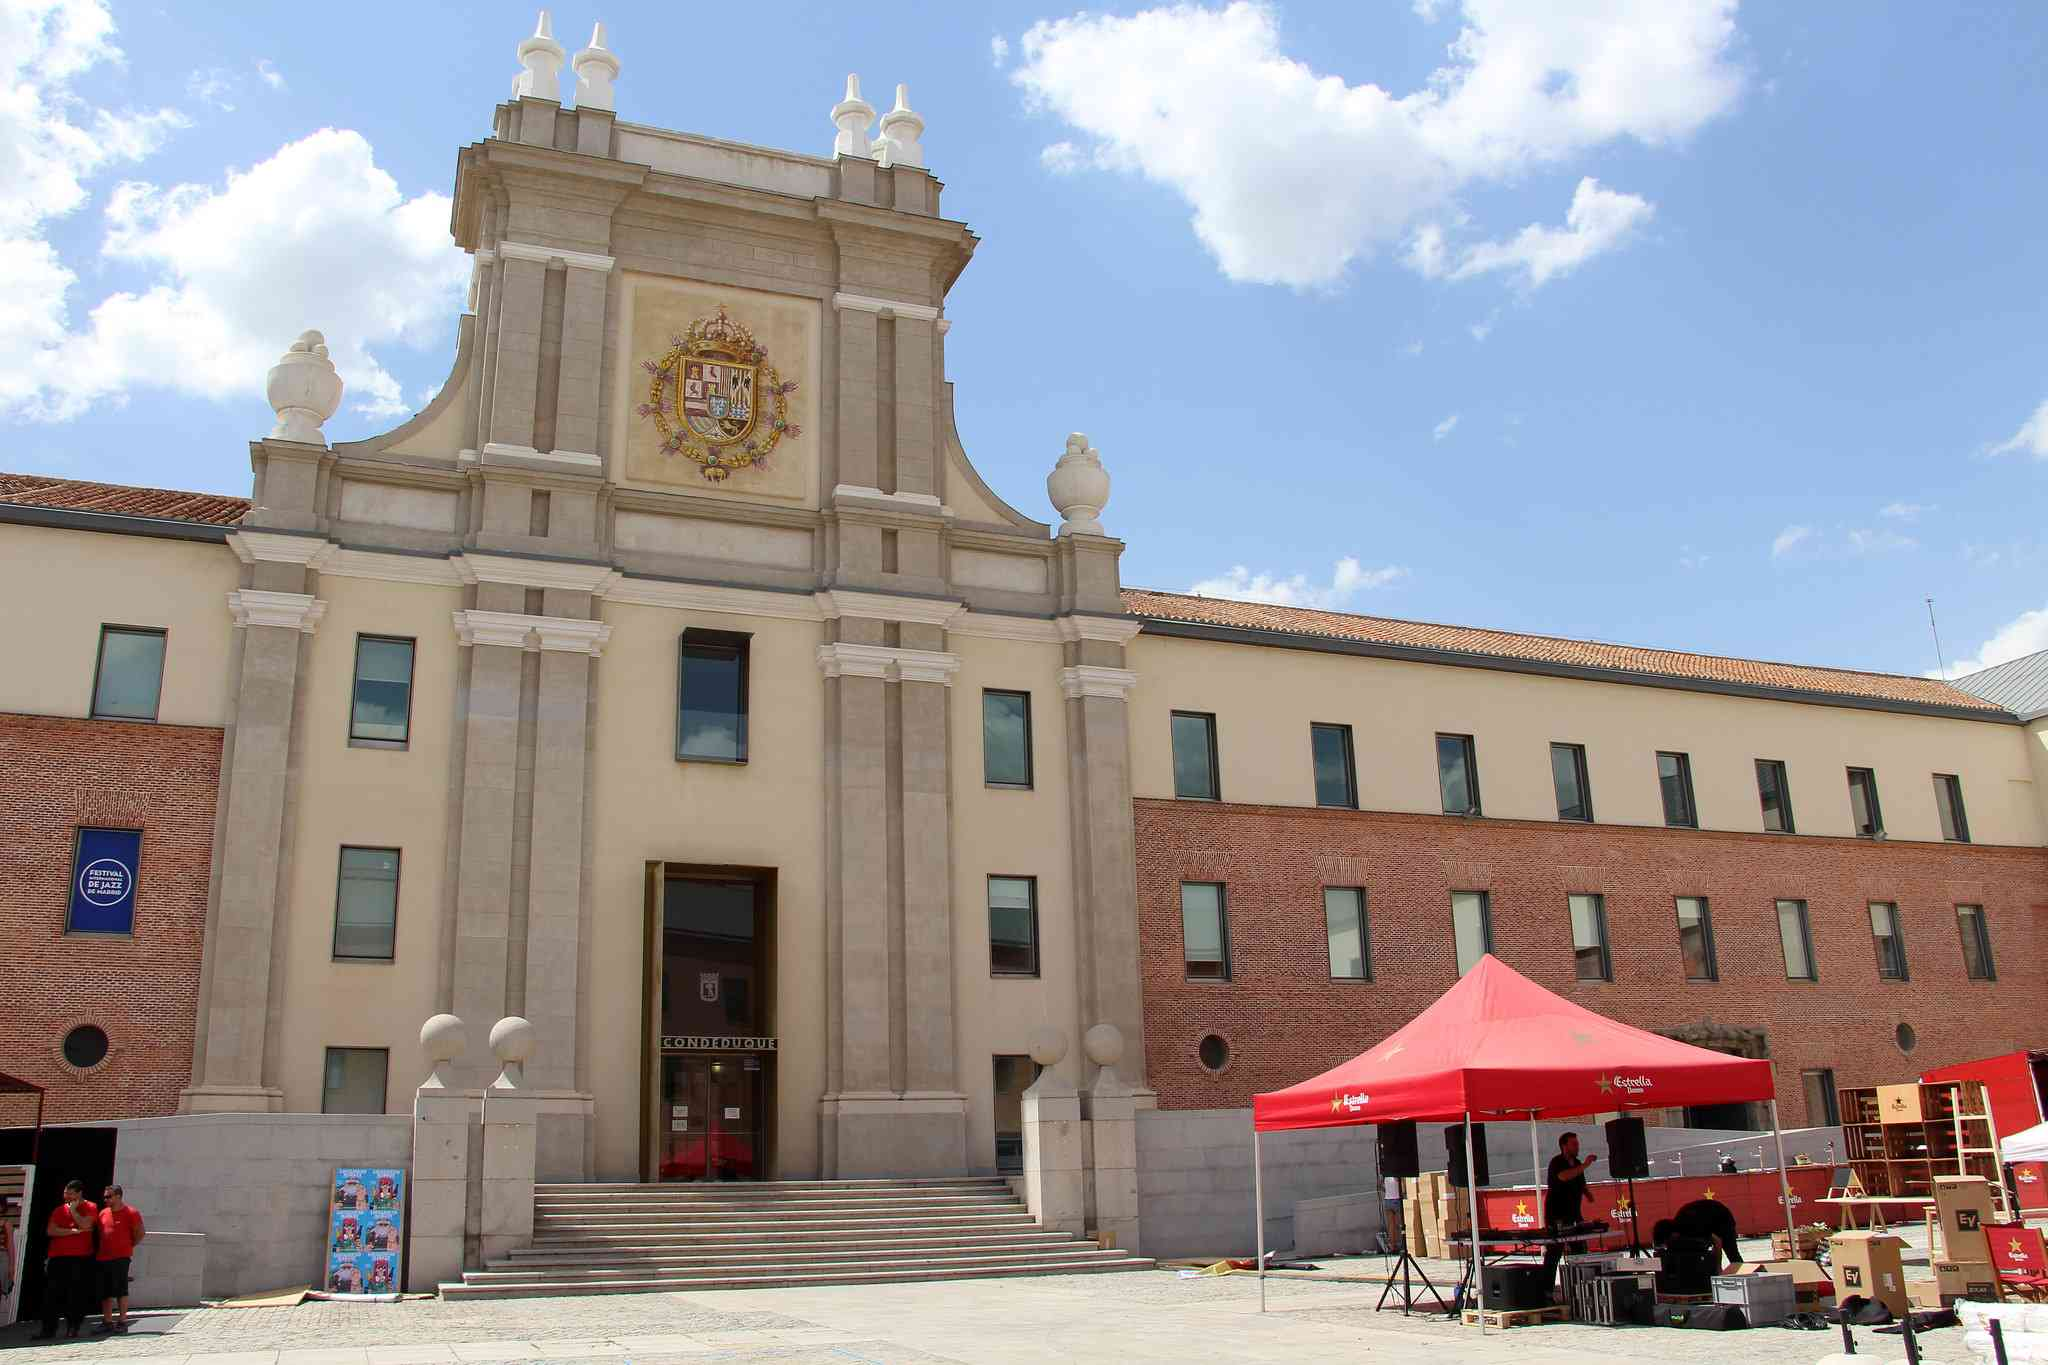 Madrid - Centro Cultural Conde Duque